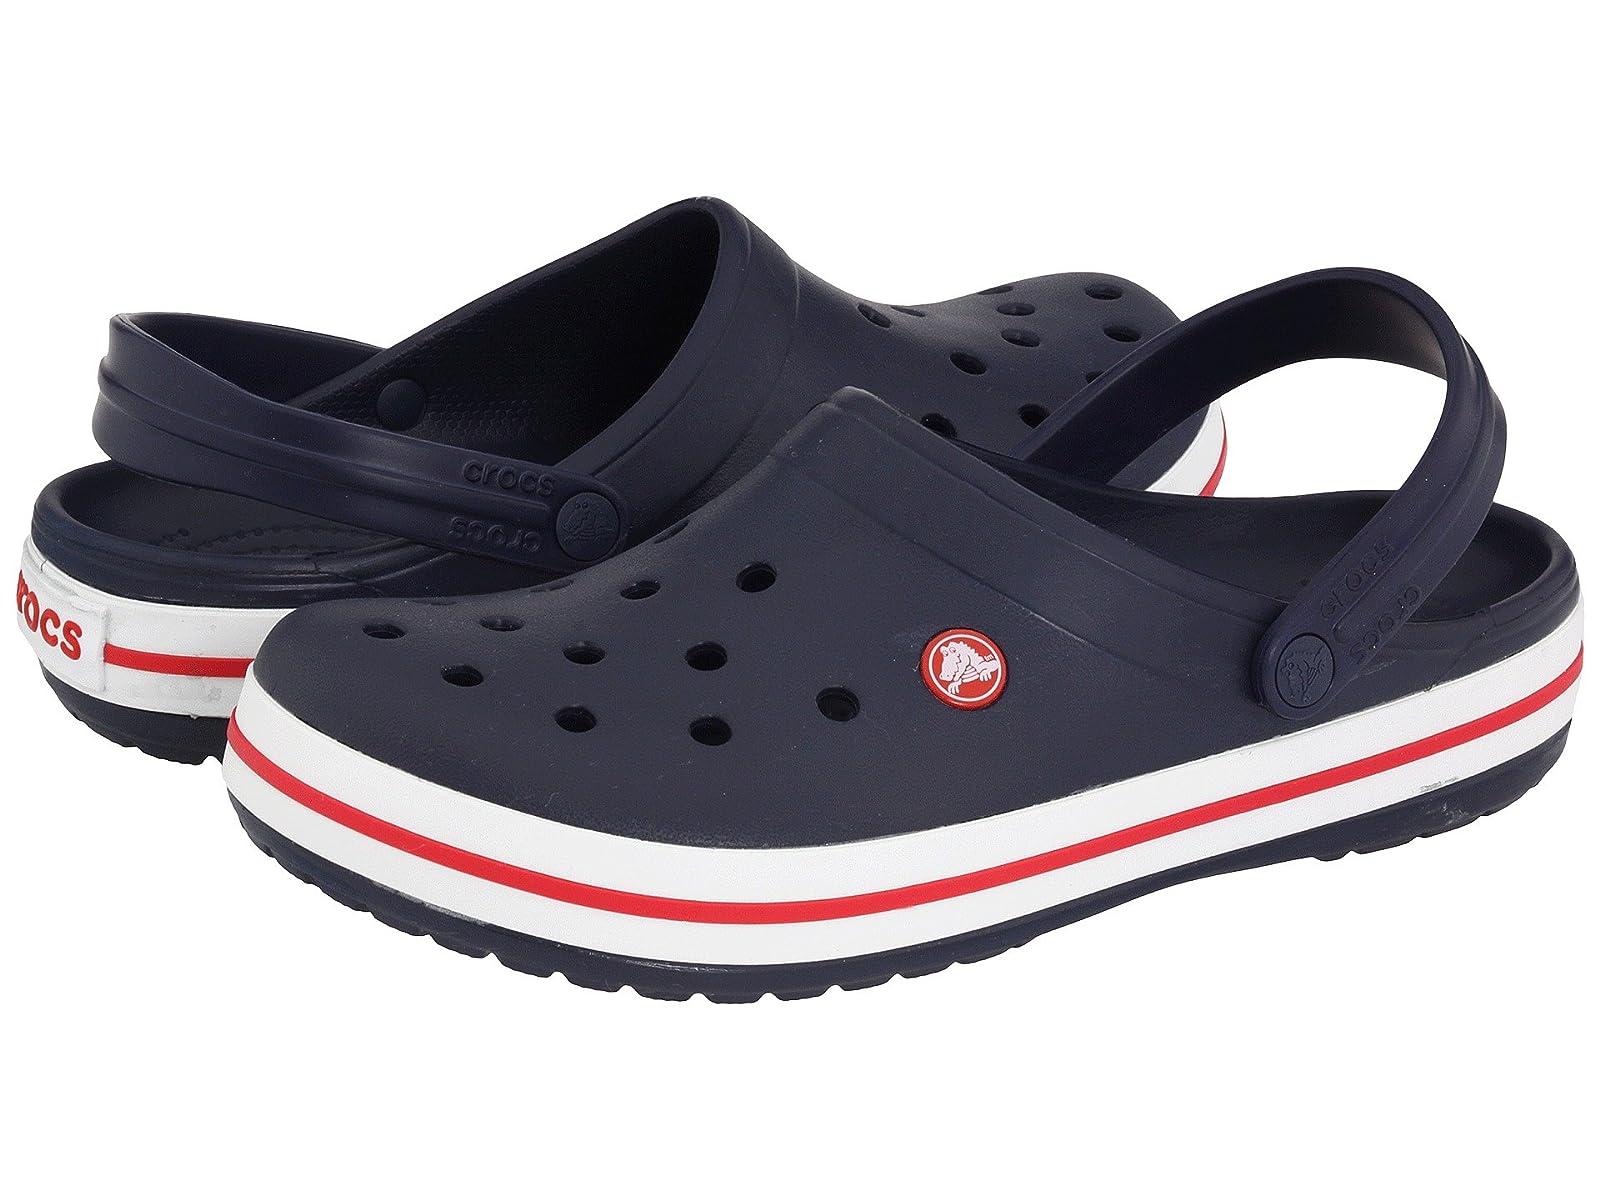 hommes hommes hommes / femmes homme / femme porter crocband clog magasin phare à crocs 0f9cce